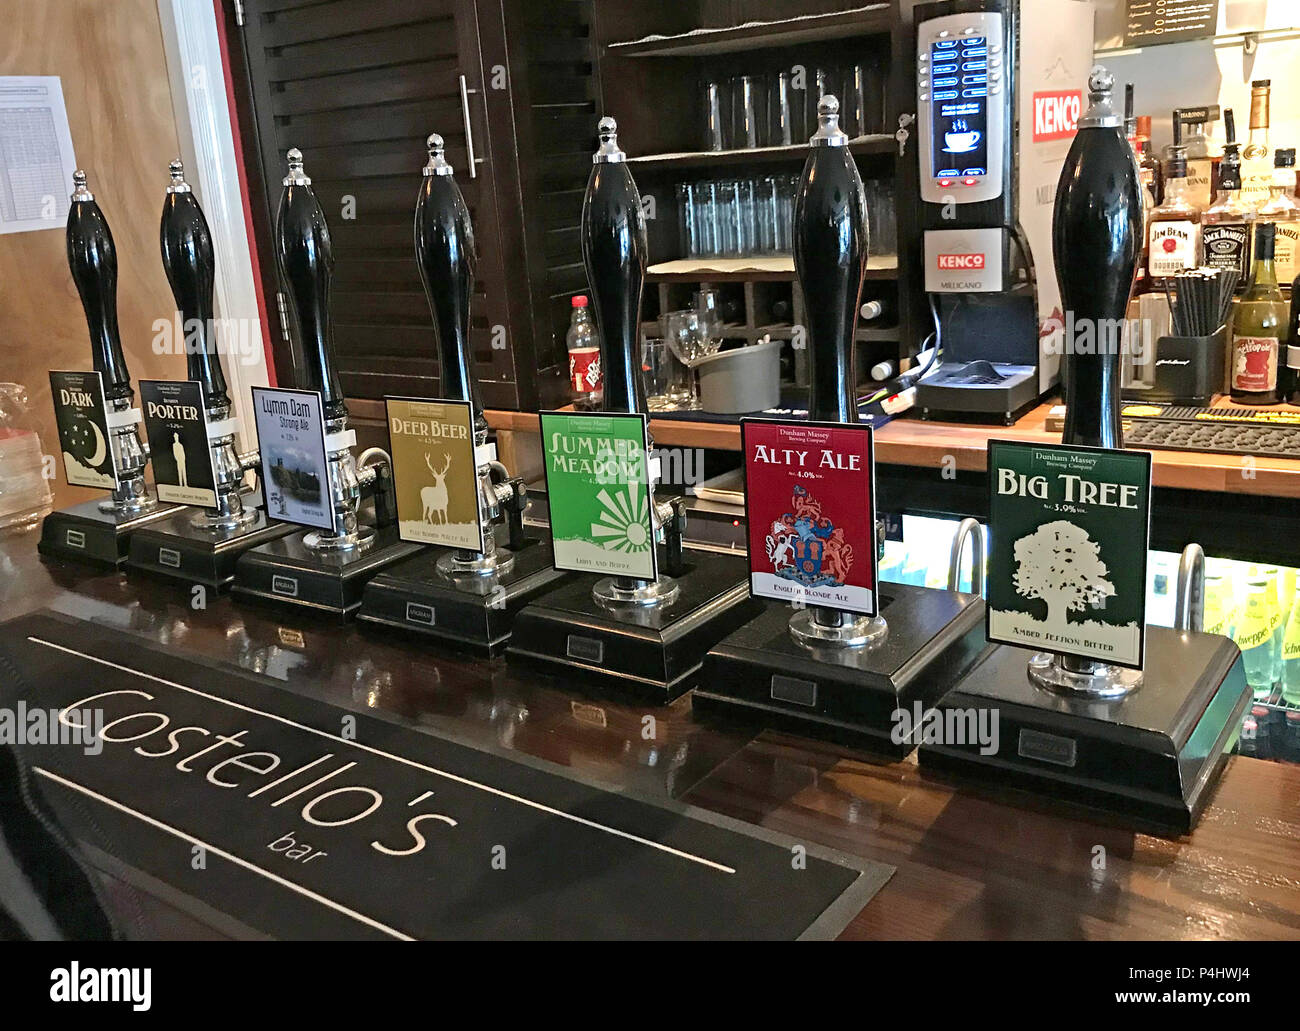 GoTonySmith,@HotpixUK,HotpixUK,bar,pub,pump,beer,big tree,Alty Ale,Alti Ale,porter,Lymm,Trafford,Greater Manchester,England,UK,CAMRA,Lymm Brewery,Goose Green,Altrincham,WA14 1DW,WA14